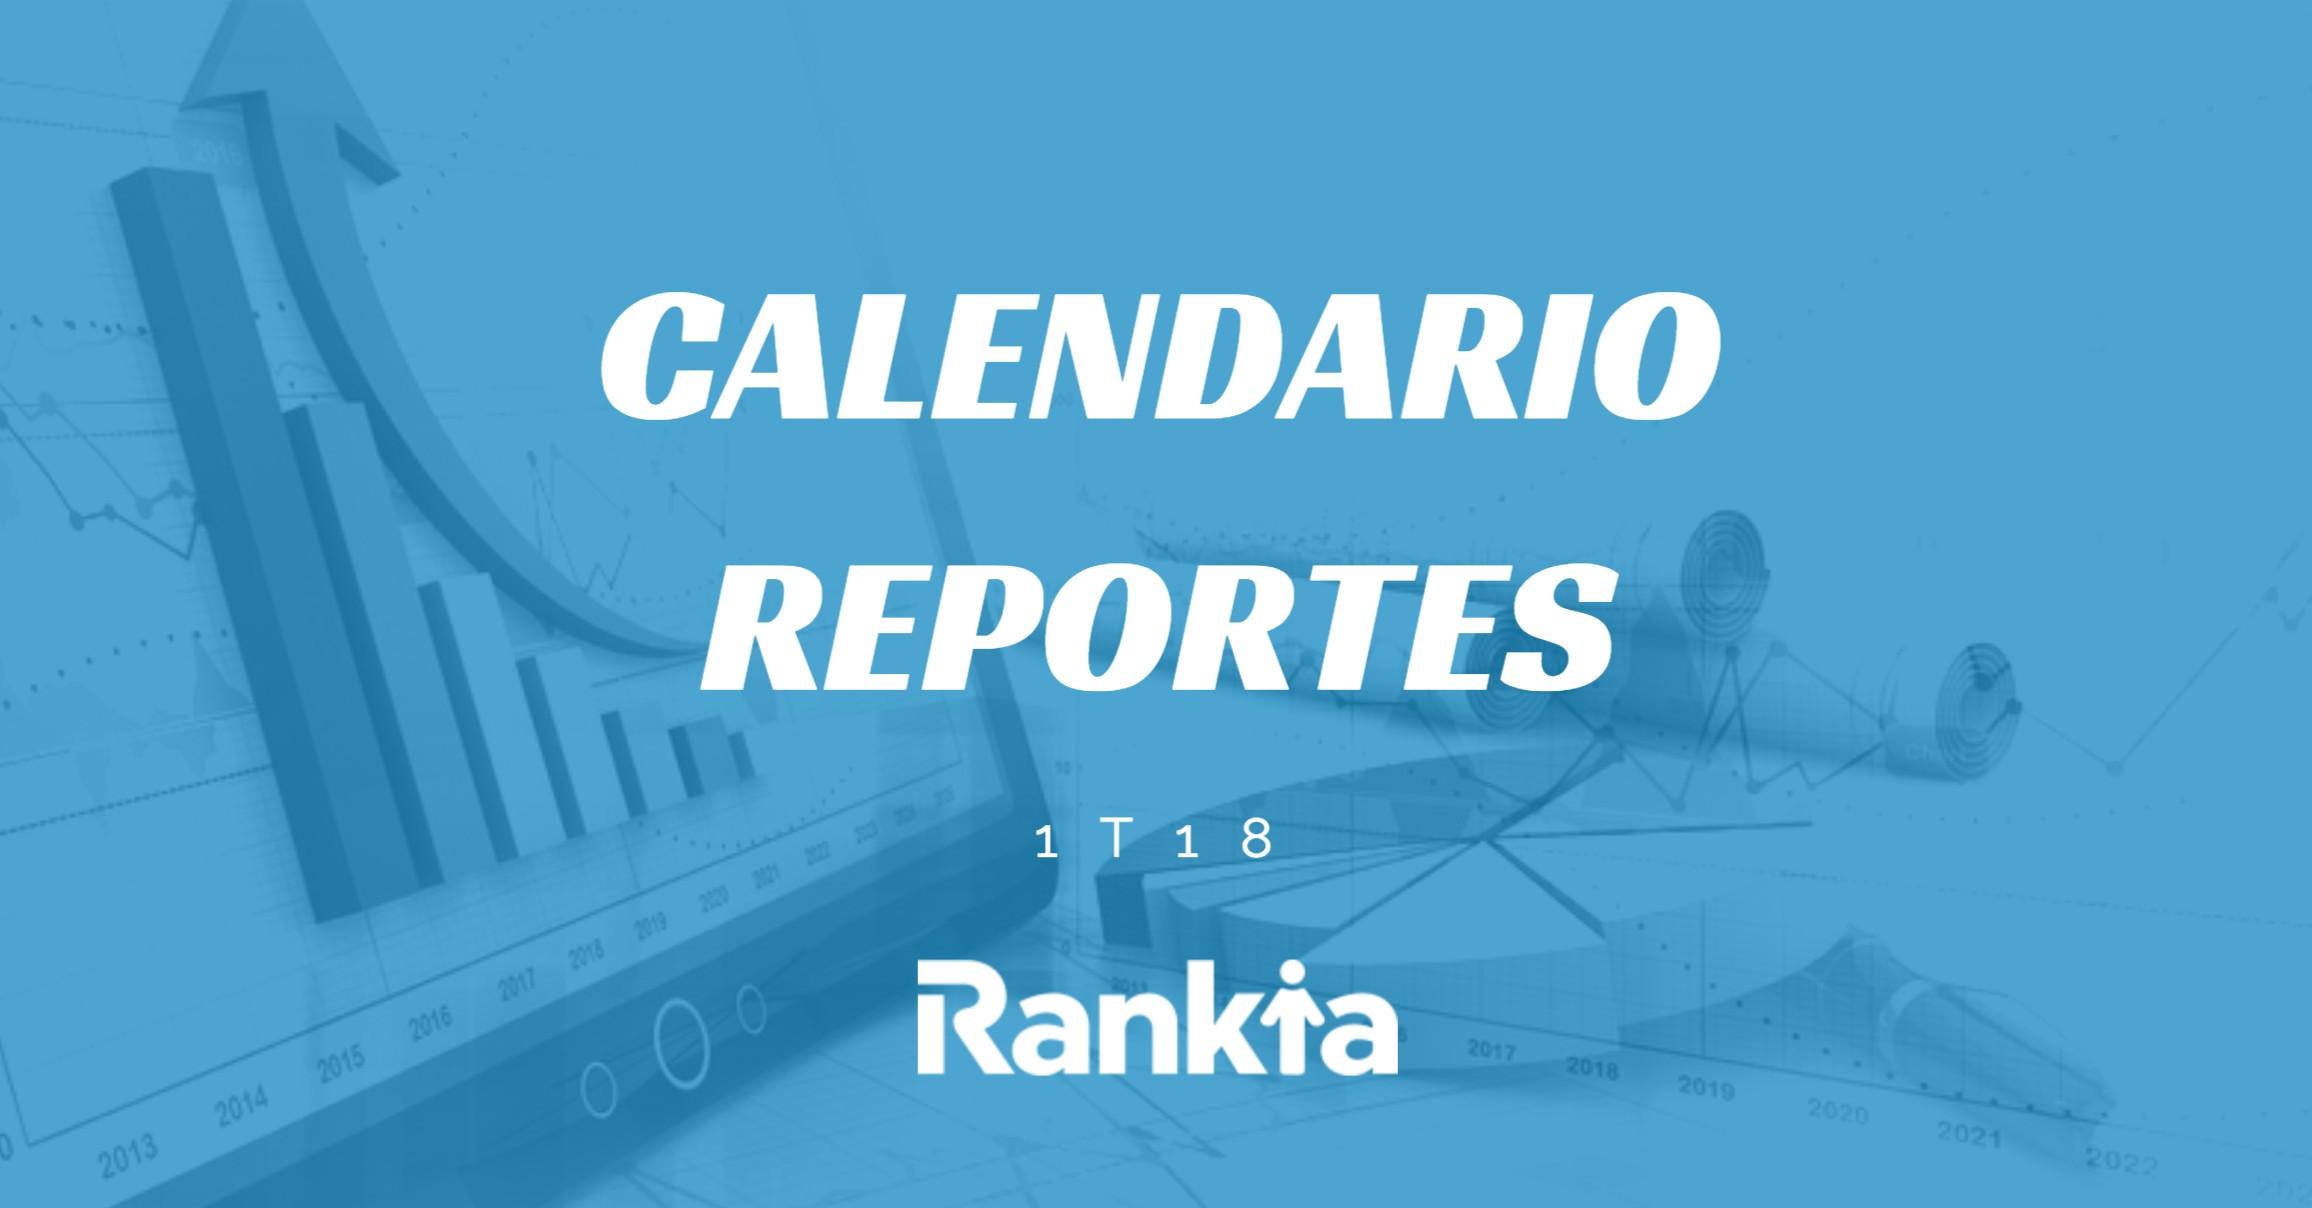 Calendario de reportes trimestrales en la Bolsa Mexicana de Valores